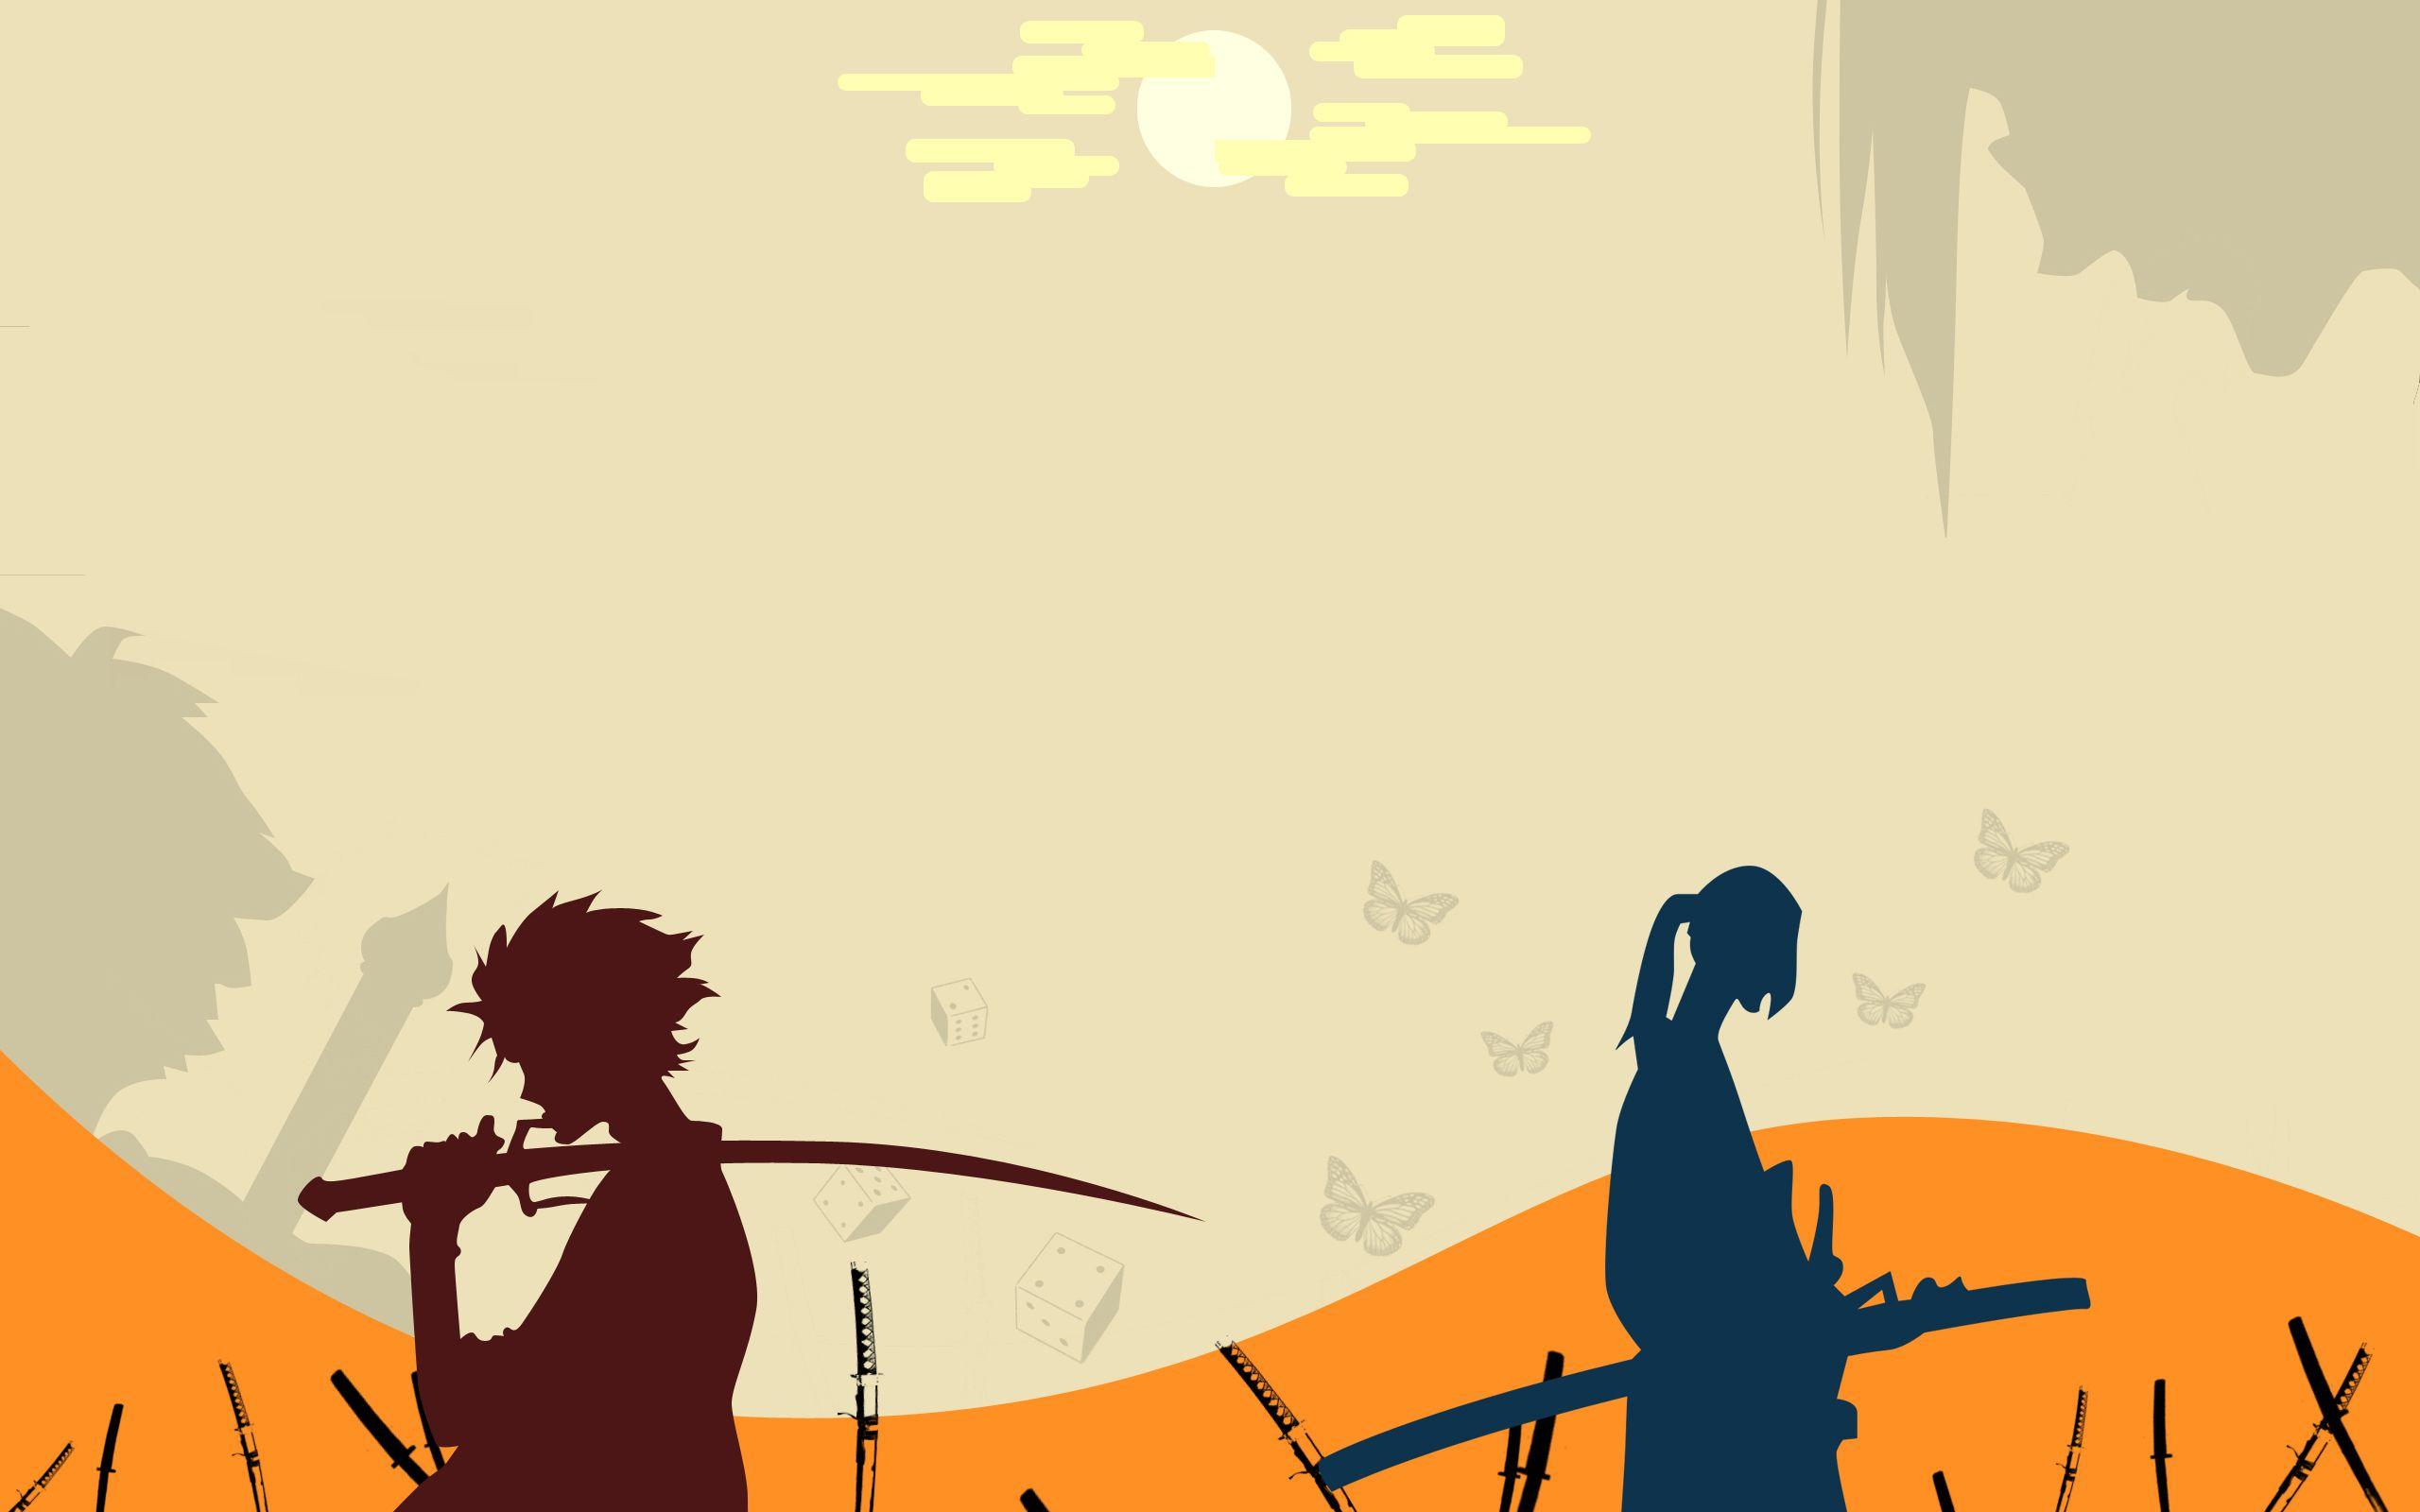 samurai champloo wallpaper 1920x1080